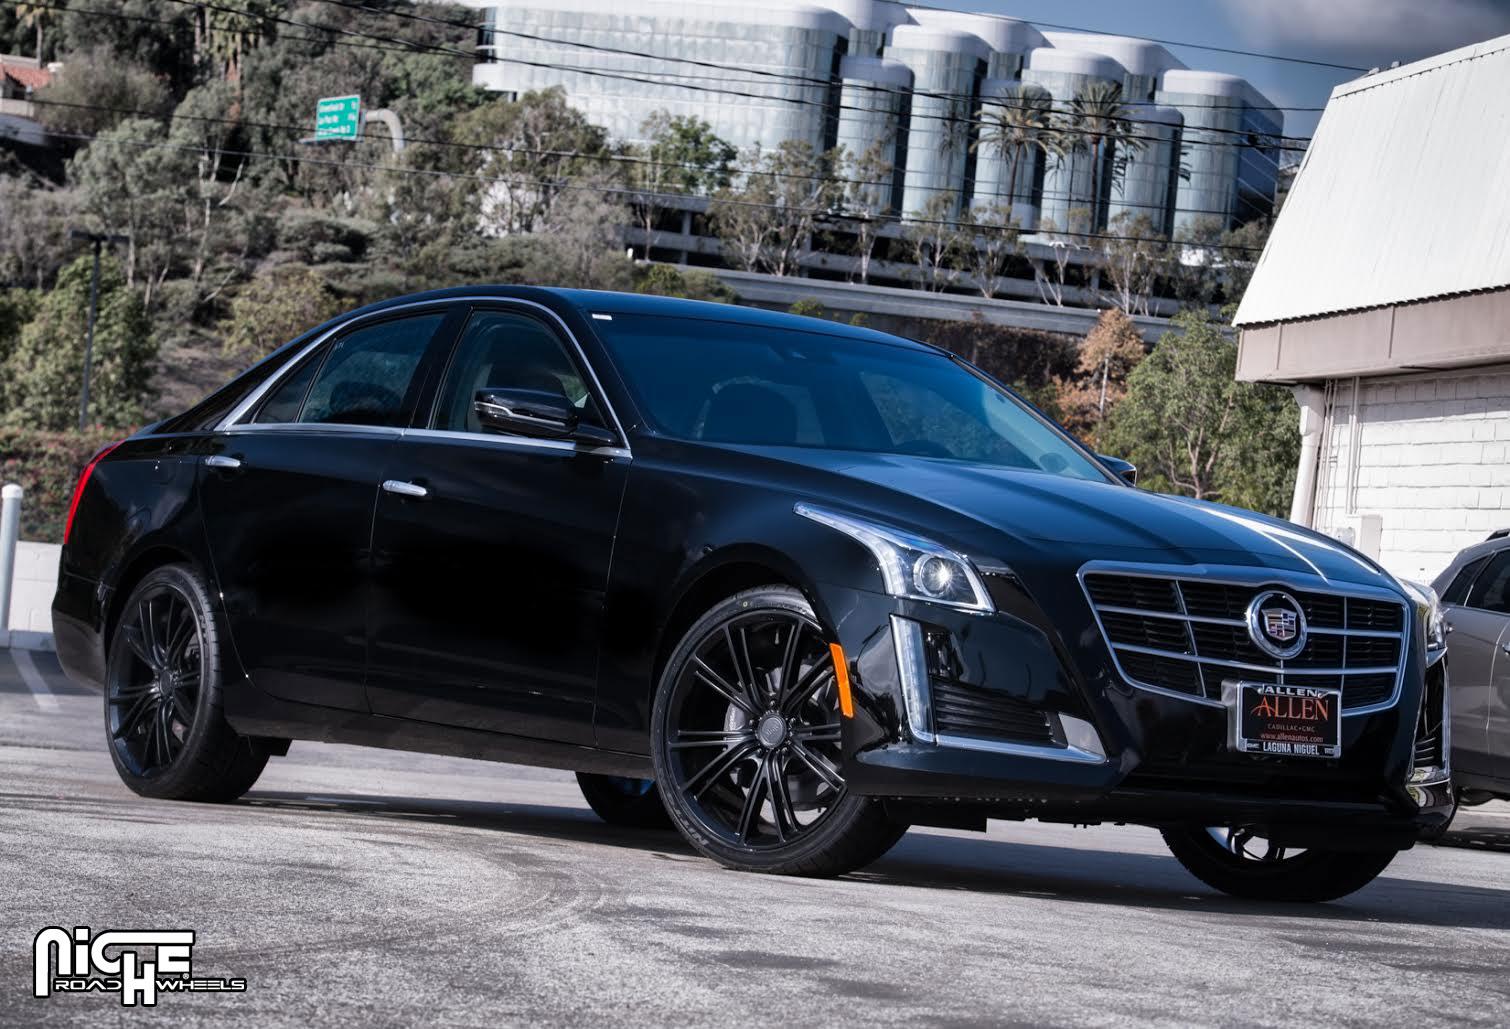 Cadillac CTS Ritz - M144 Gallery - MHT Wheels Inc.